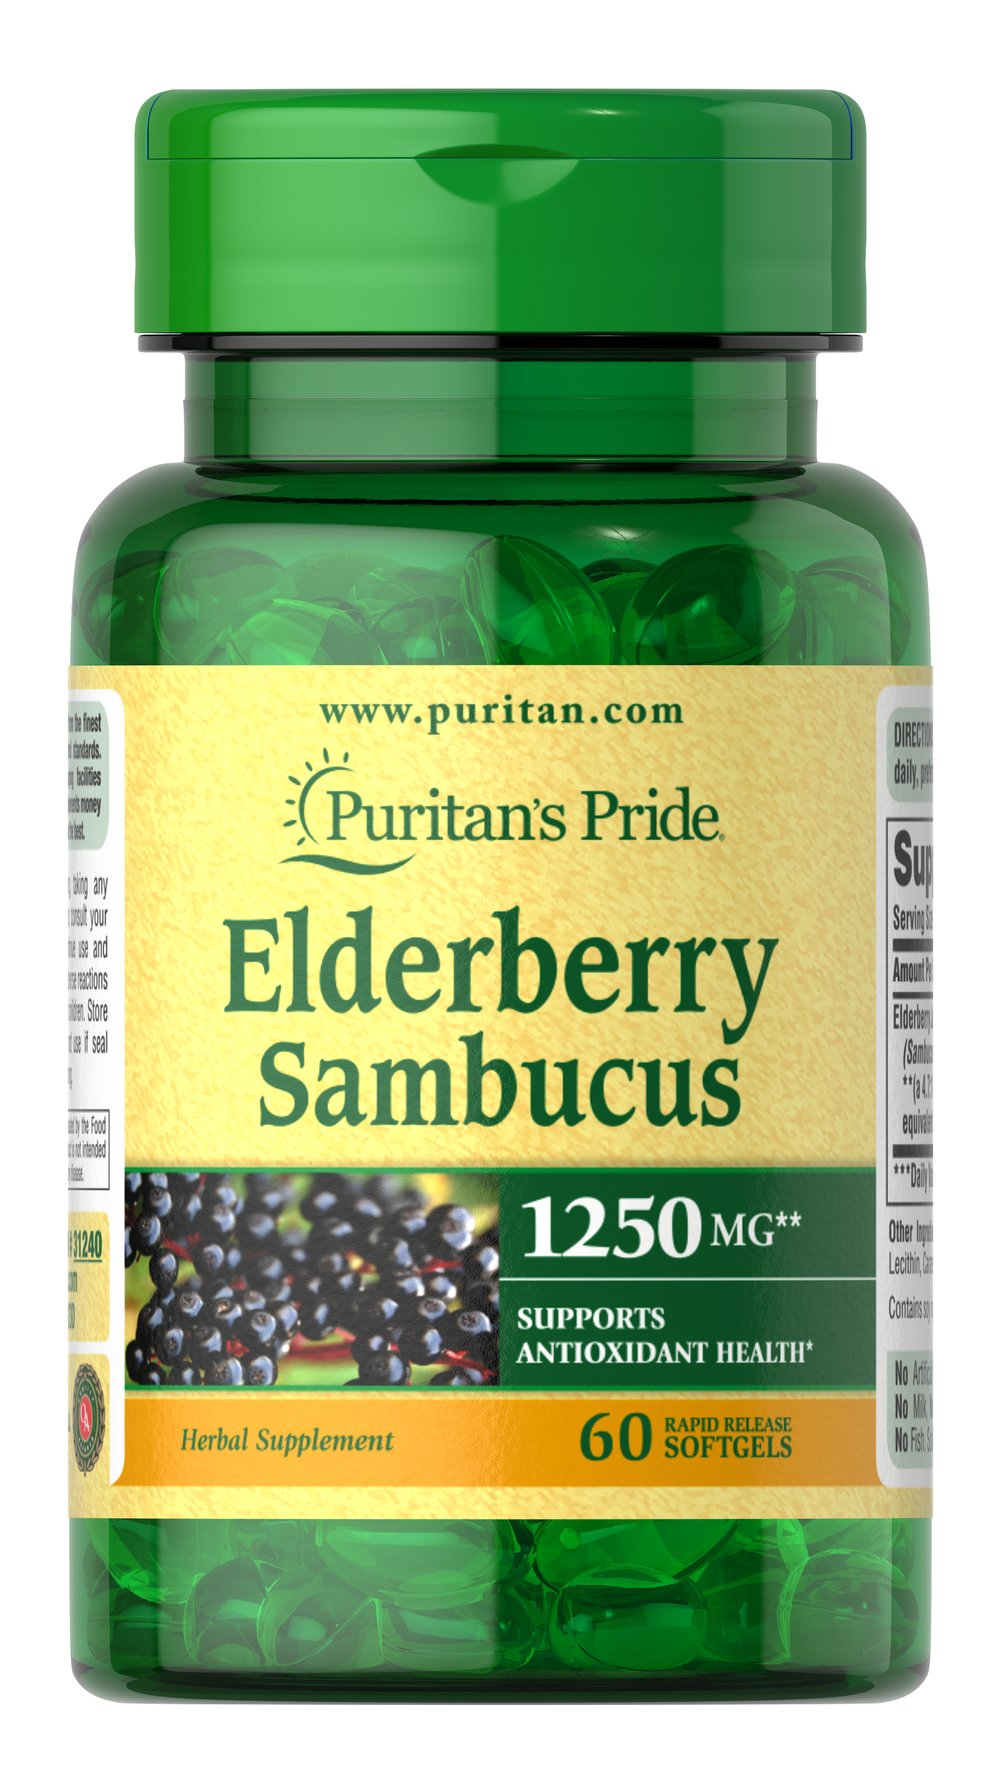 Puritan's Pride Elderberry Sambucus 1250 mg - 60 Softgels ...